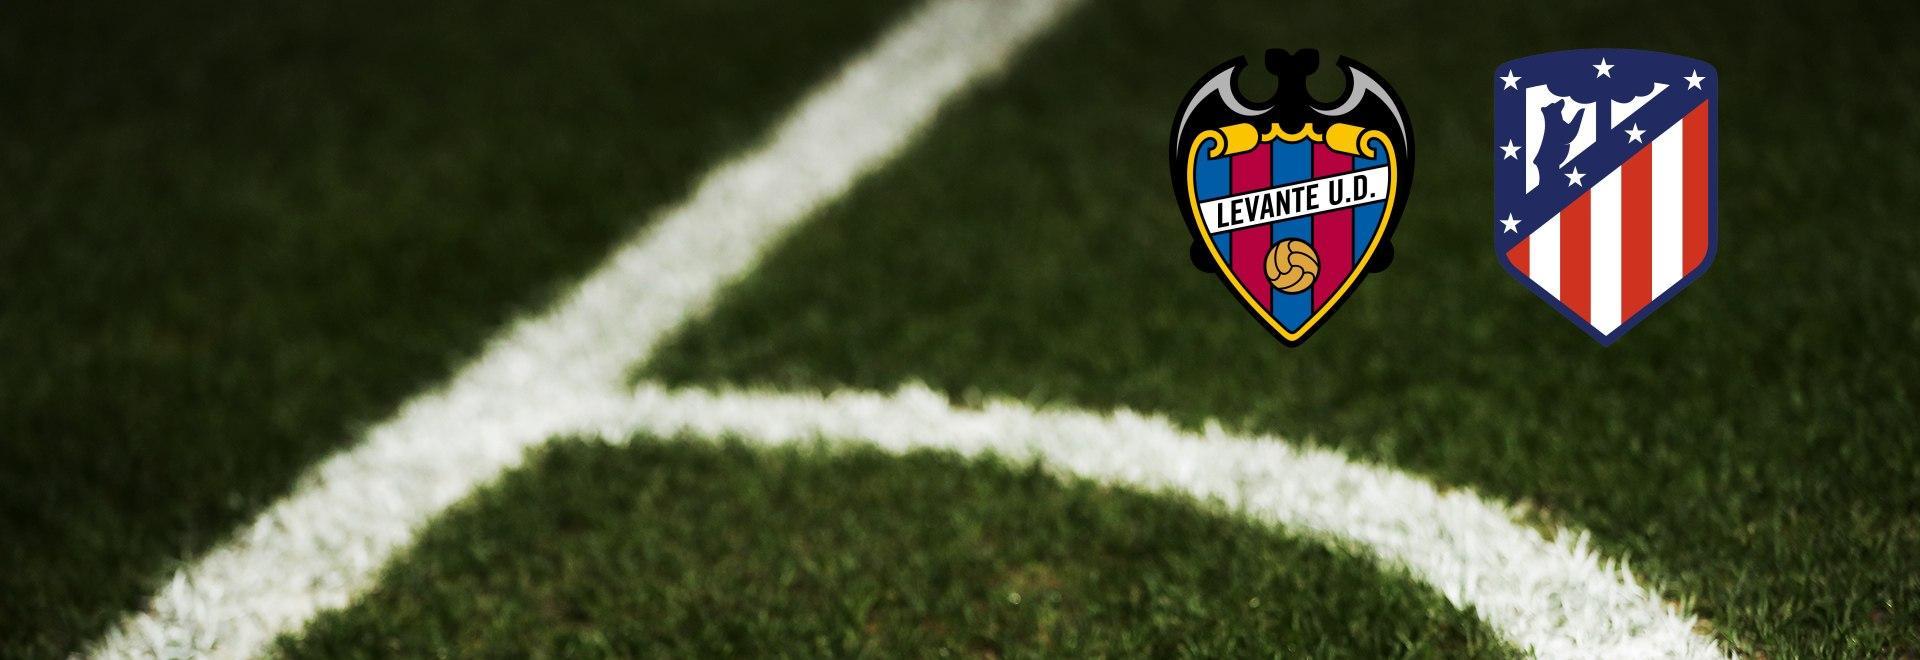 Levante - Atletico Madrid. 2a g.